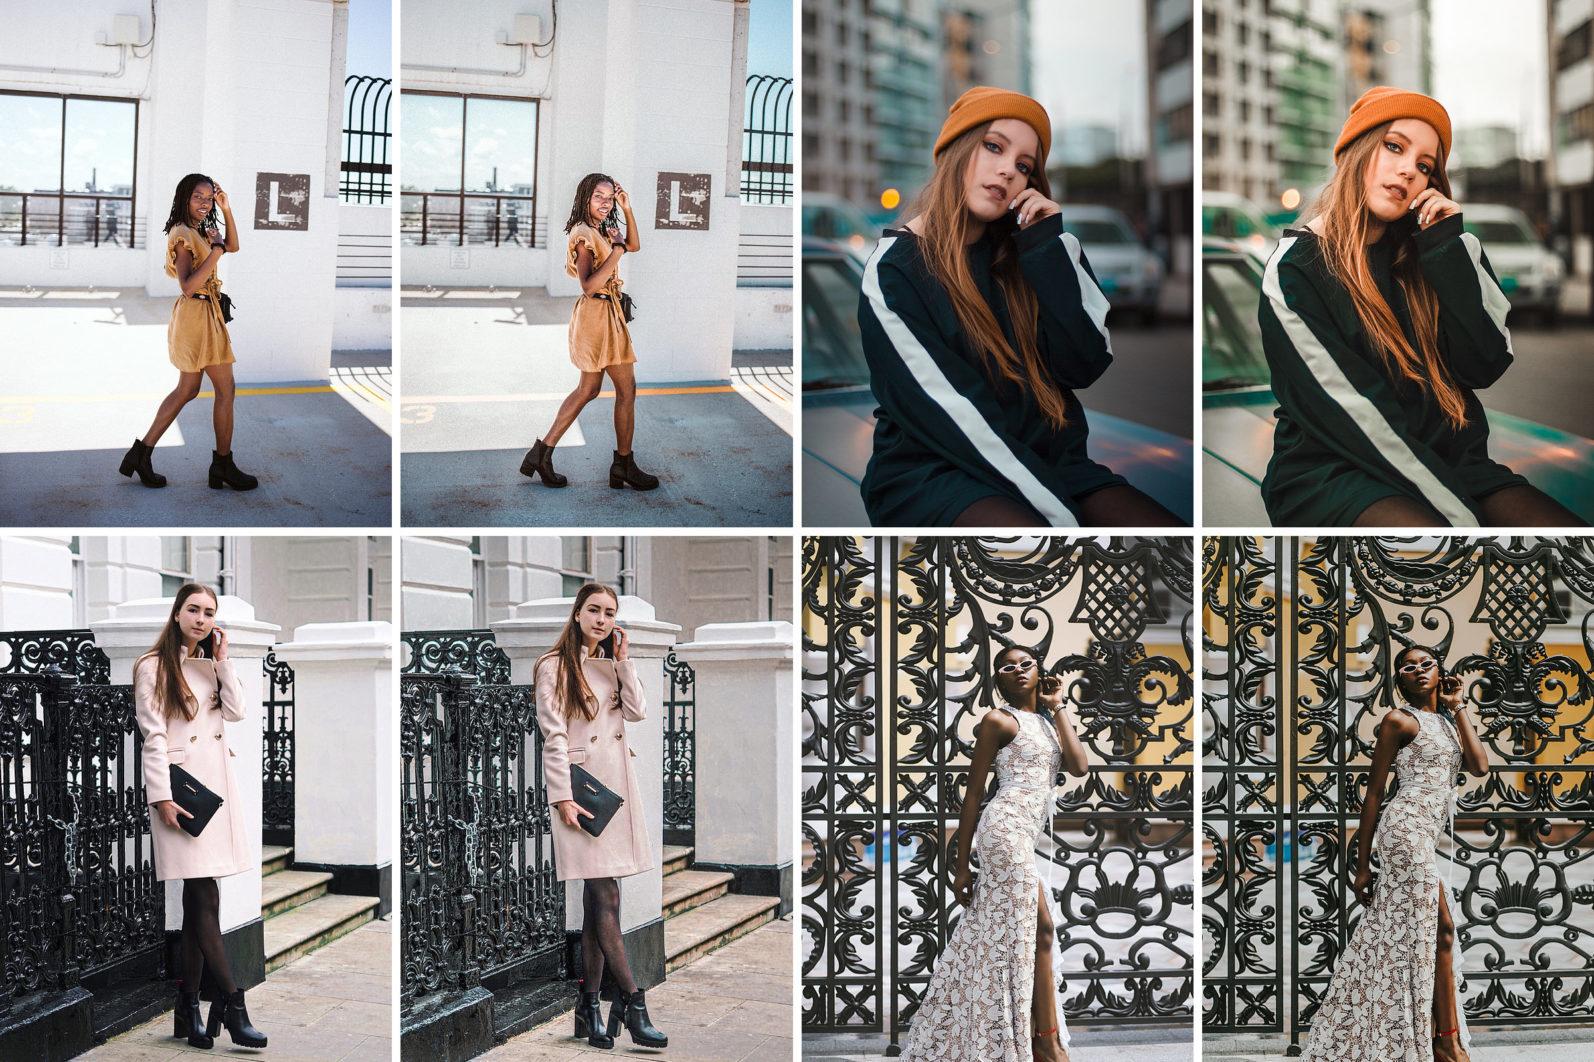 39. Street Fashion - 39.STREETFASHION 6 -